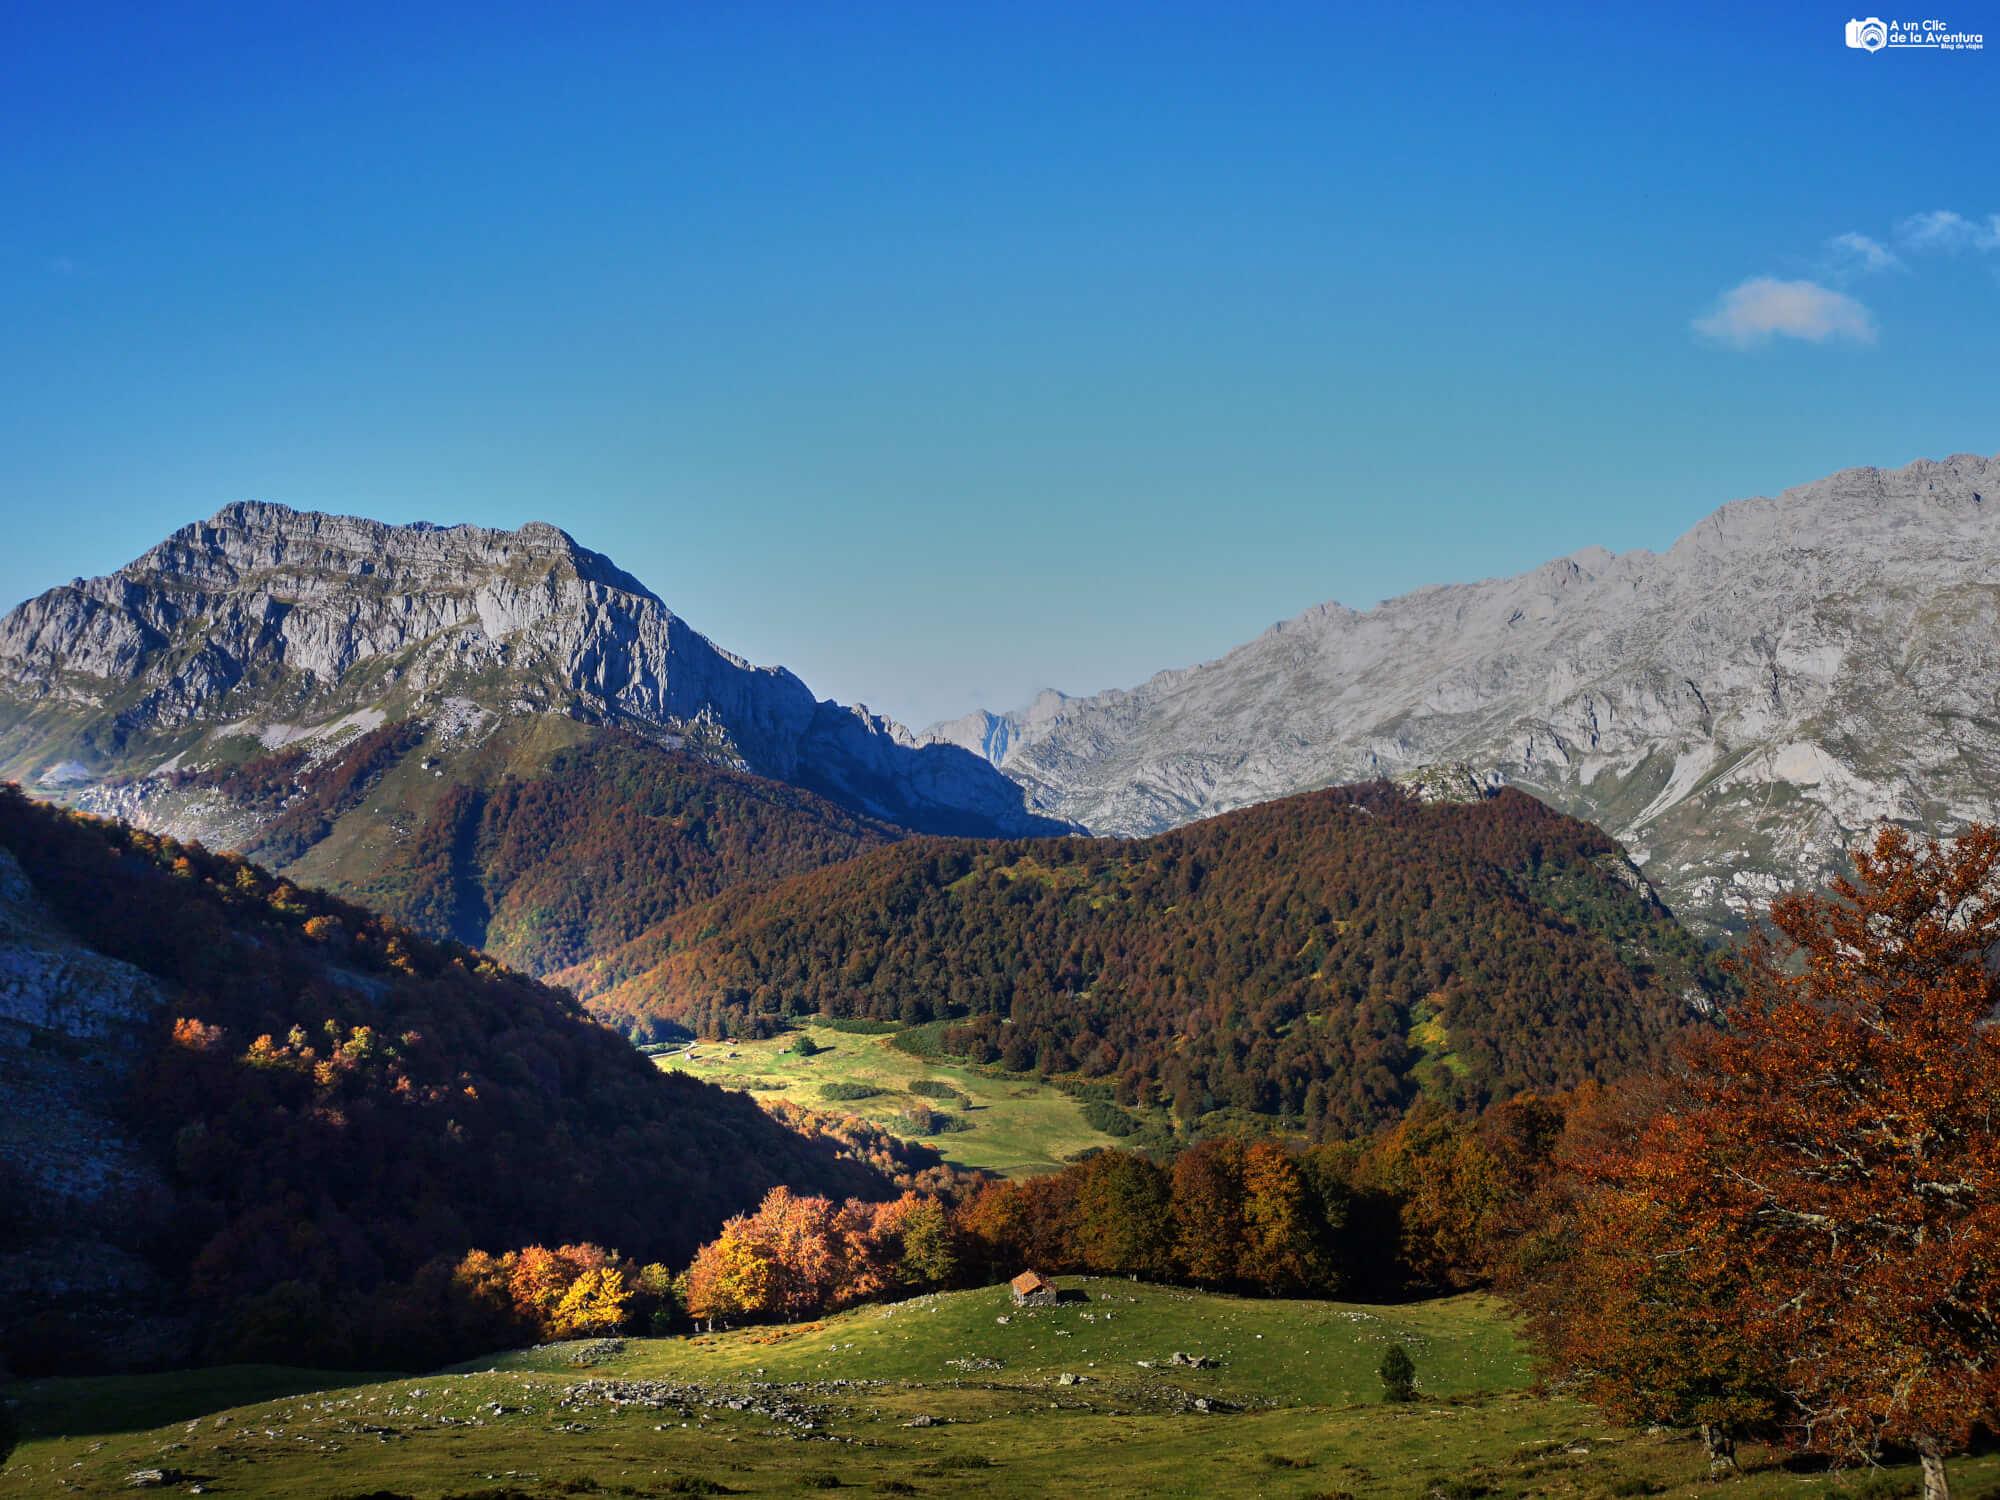 Ruta de la Majada de Vegabaño - Rutas por los Picos de Europa